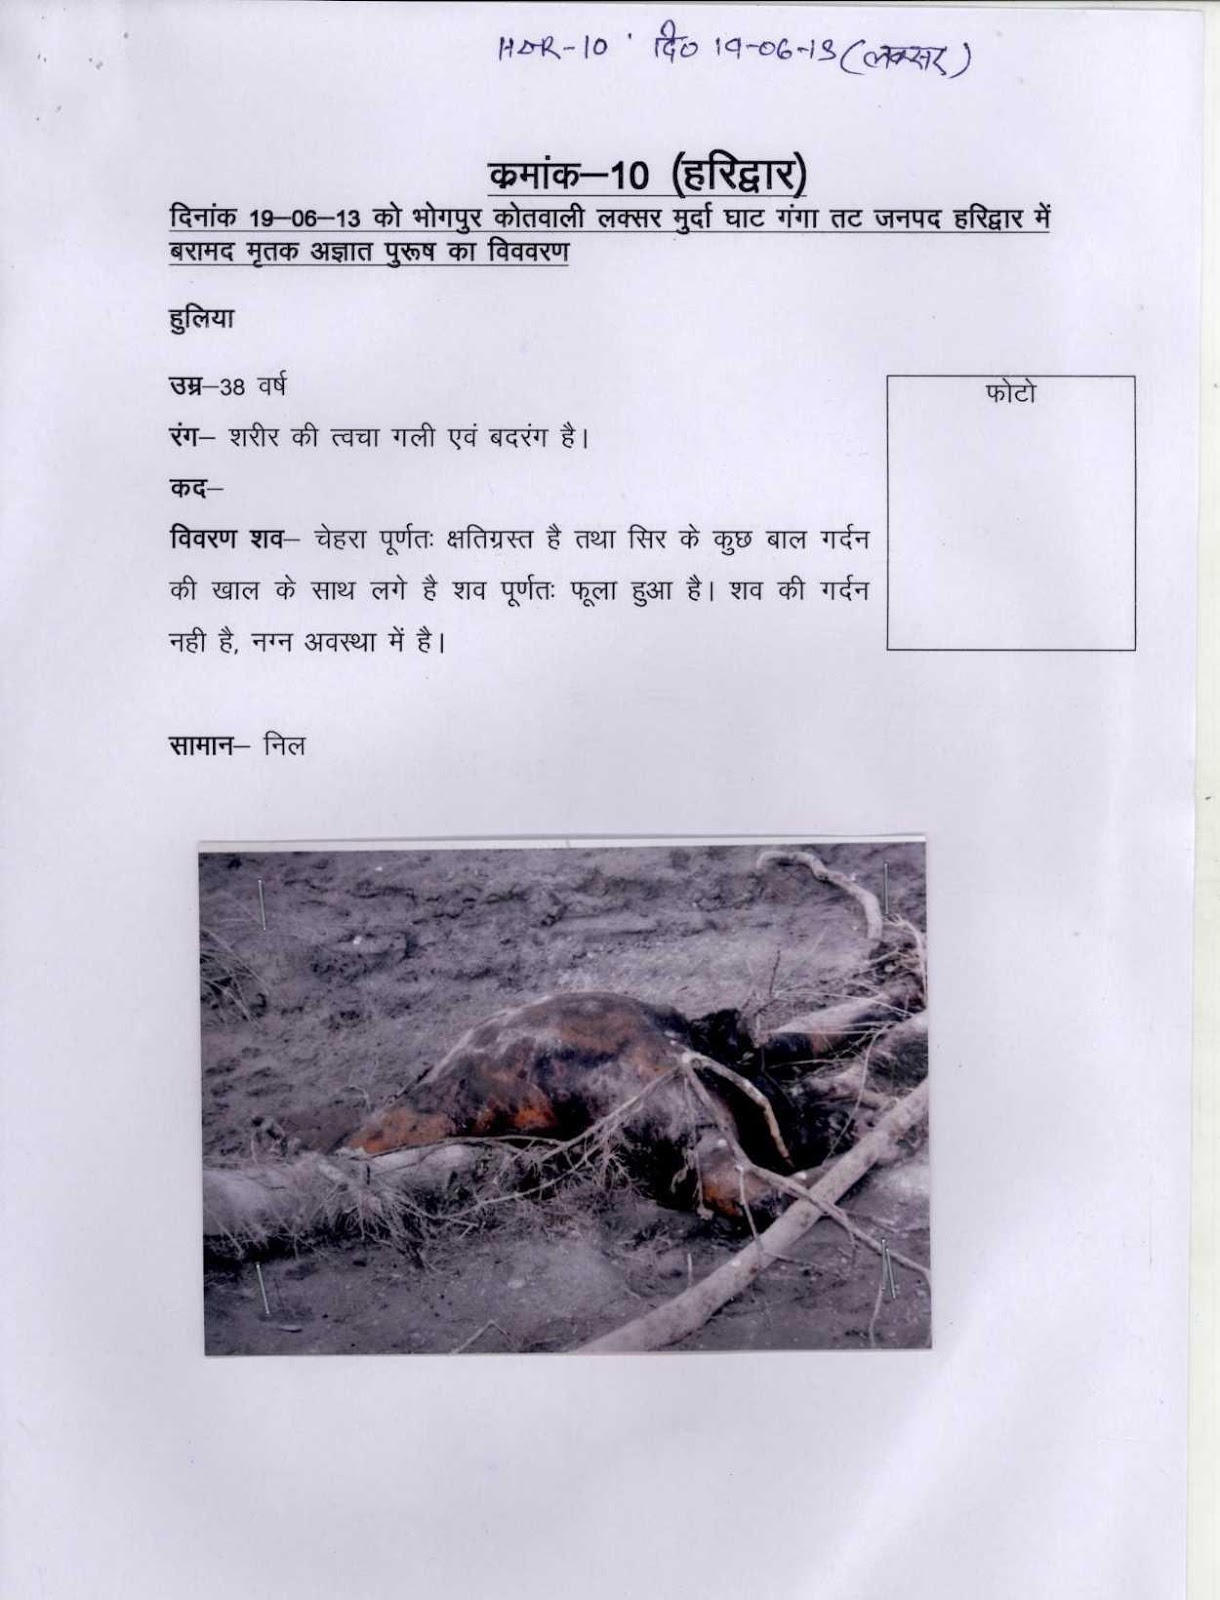 cricket batting tips in hindi language pdf